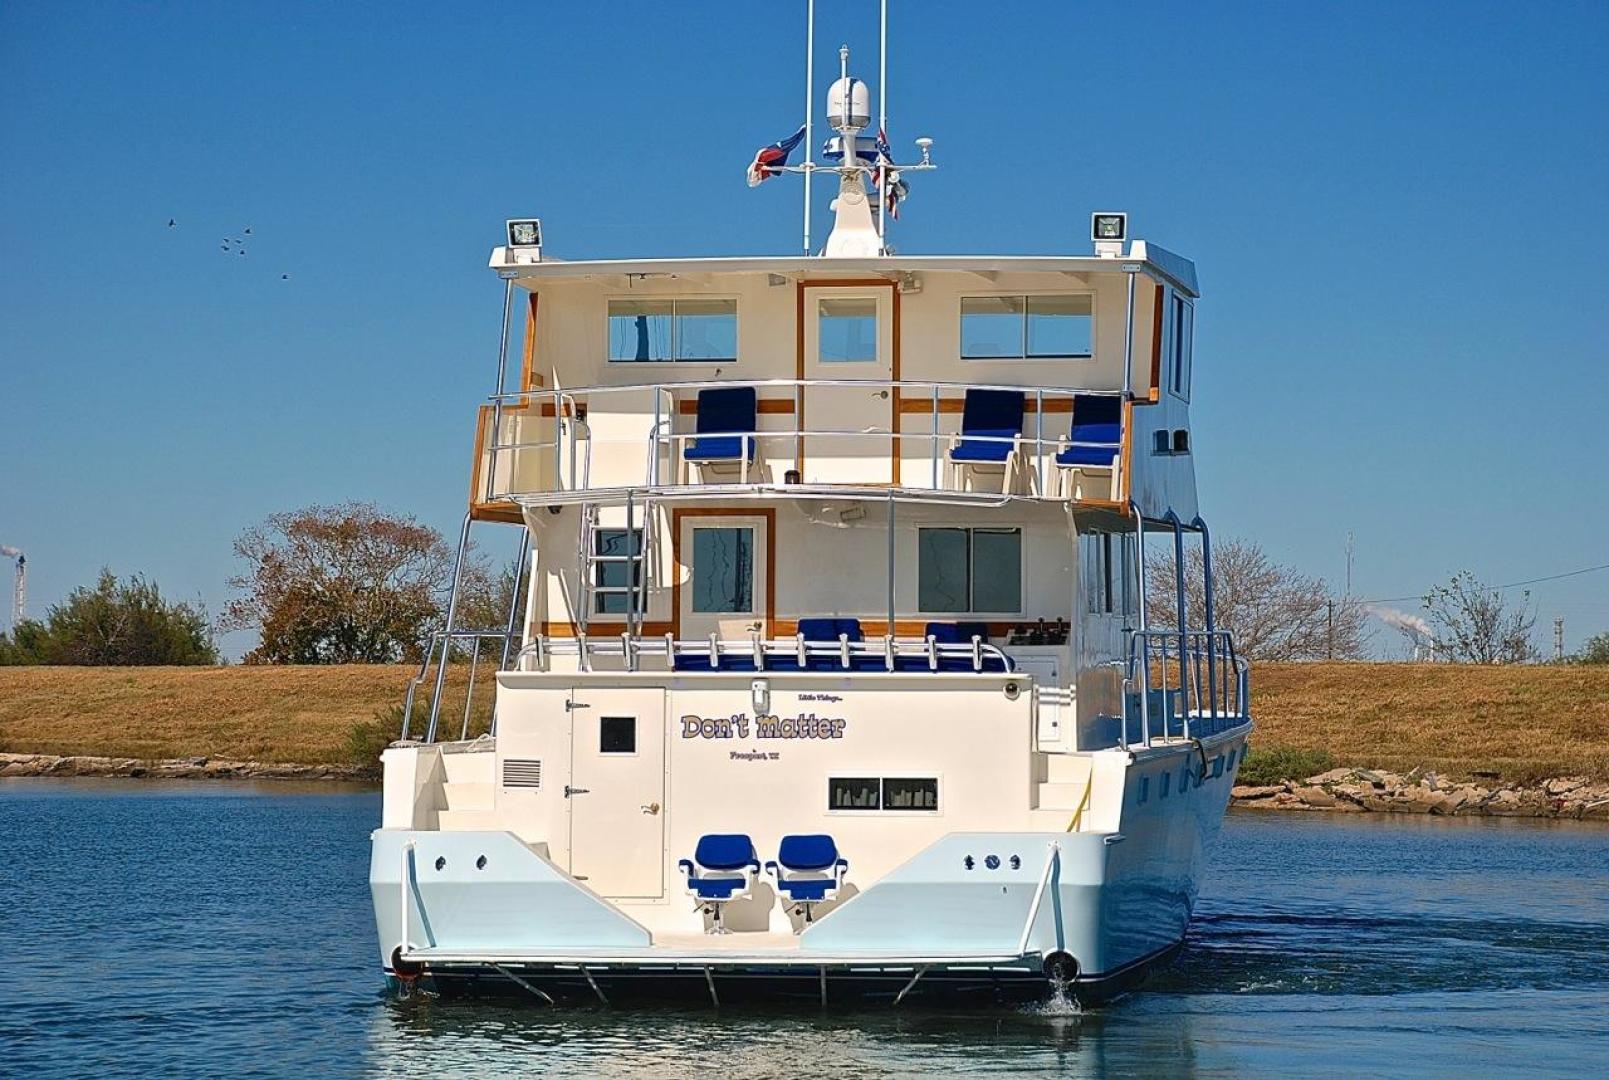 Infinity-Cockpit Motor Yacht 2001-Dont Matter Houston-Texas-United States-Stern Profile-1005587 | Thumbnail